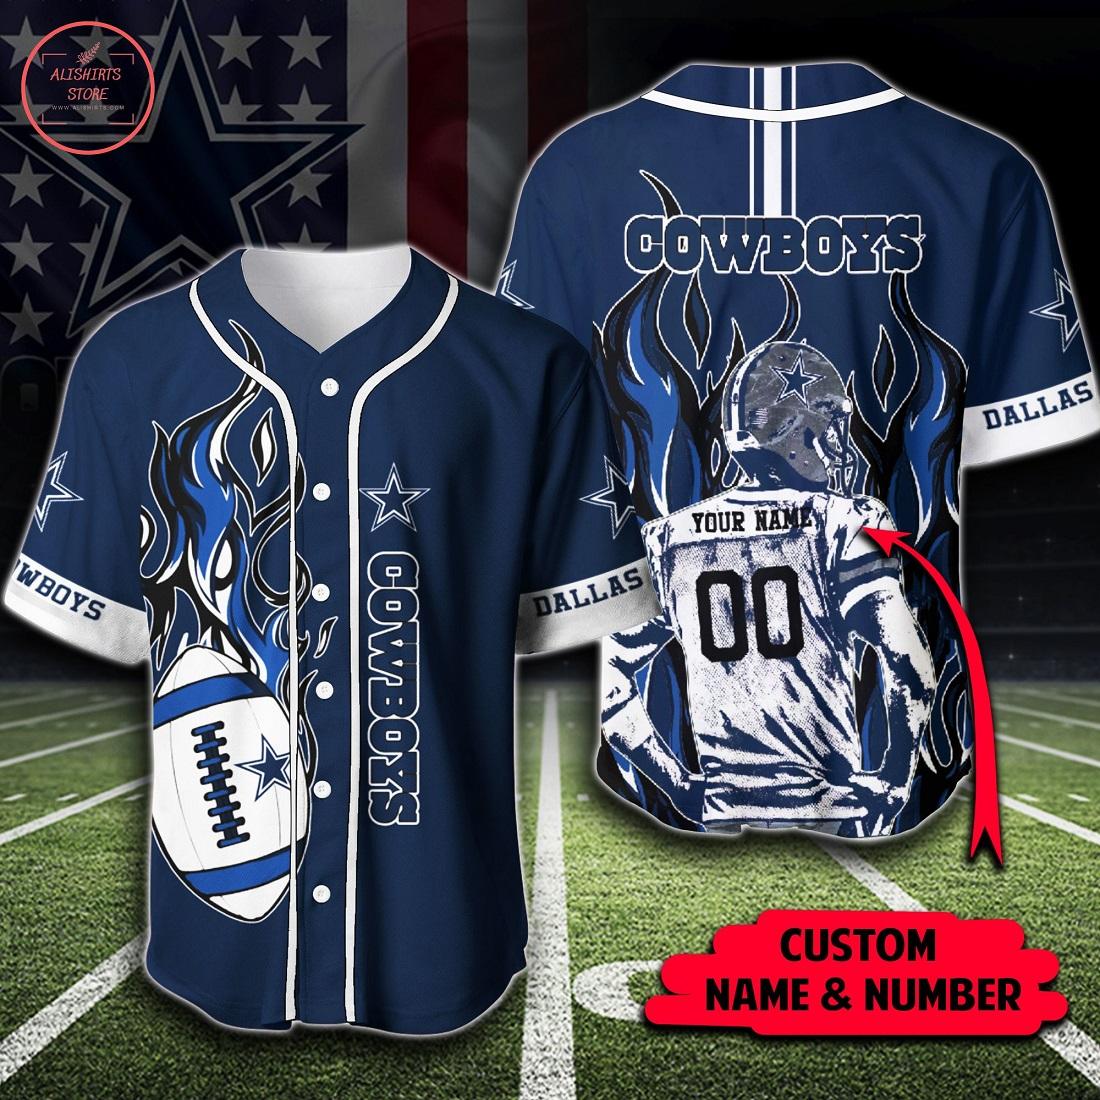 NFL Dallas Cowboys Personalized Baseball Jersey